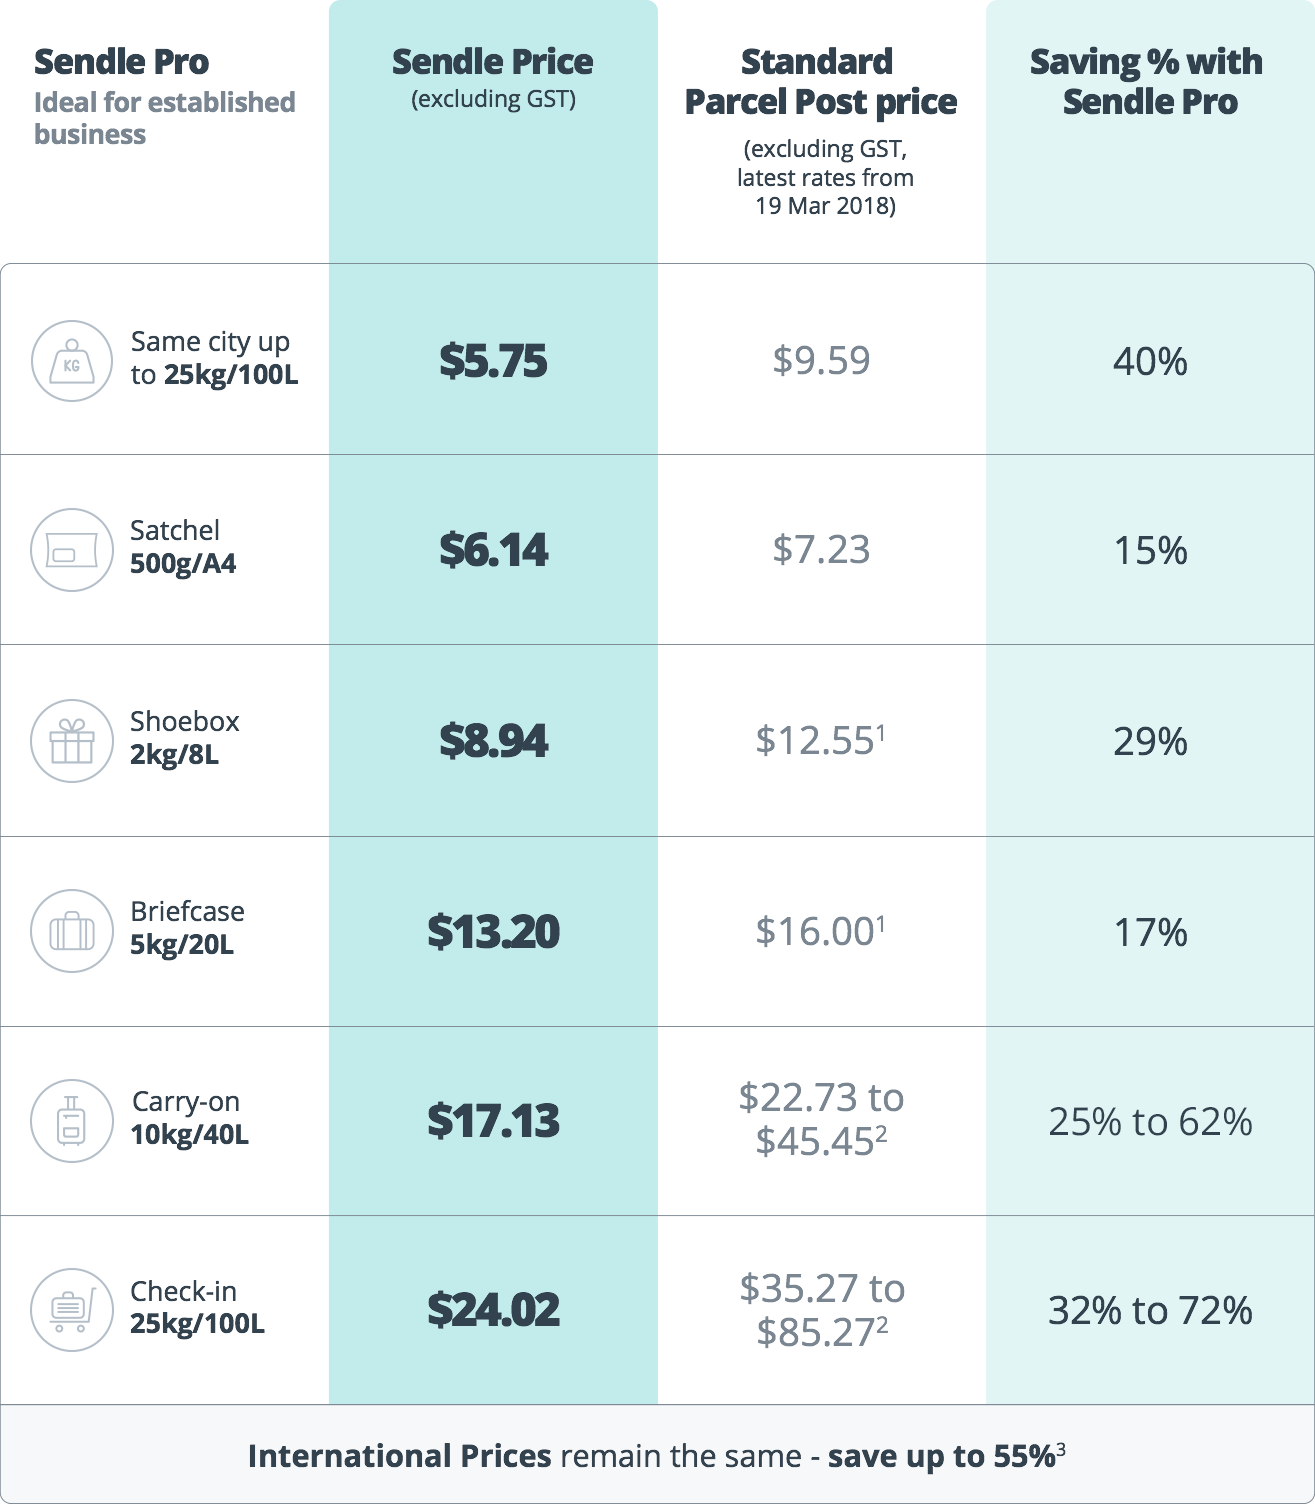 Sendle Pro Pricing